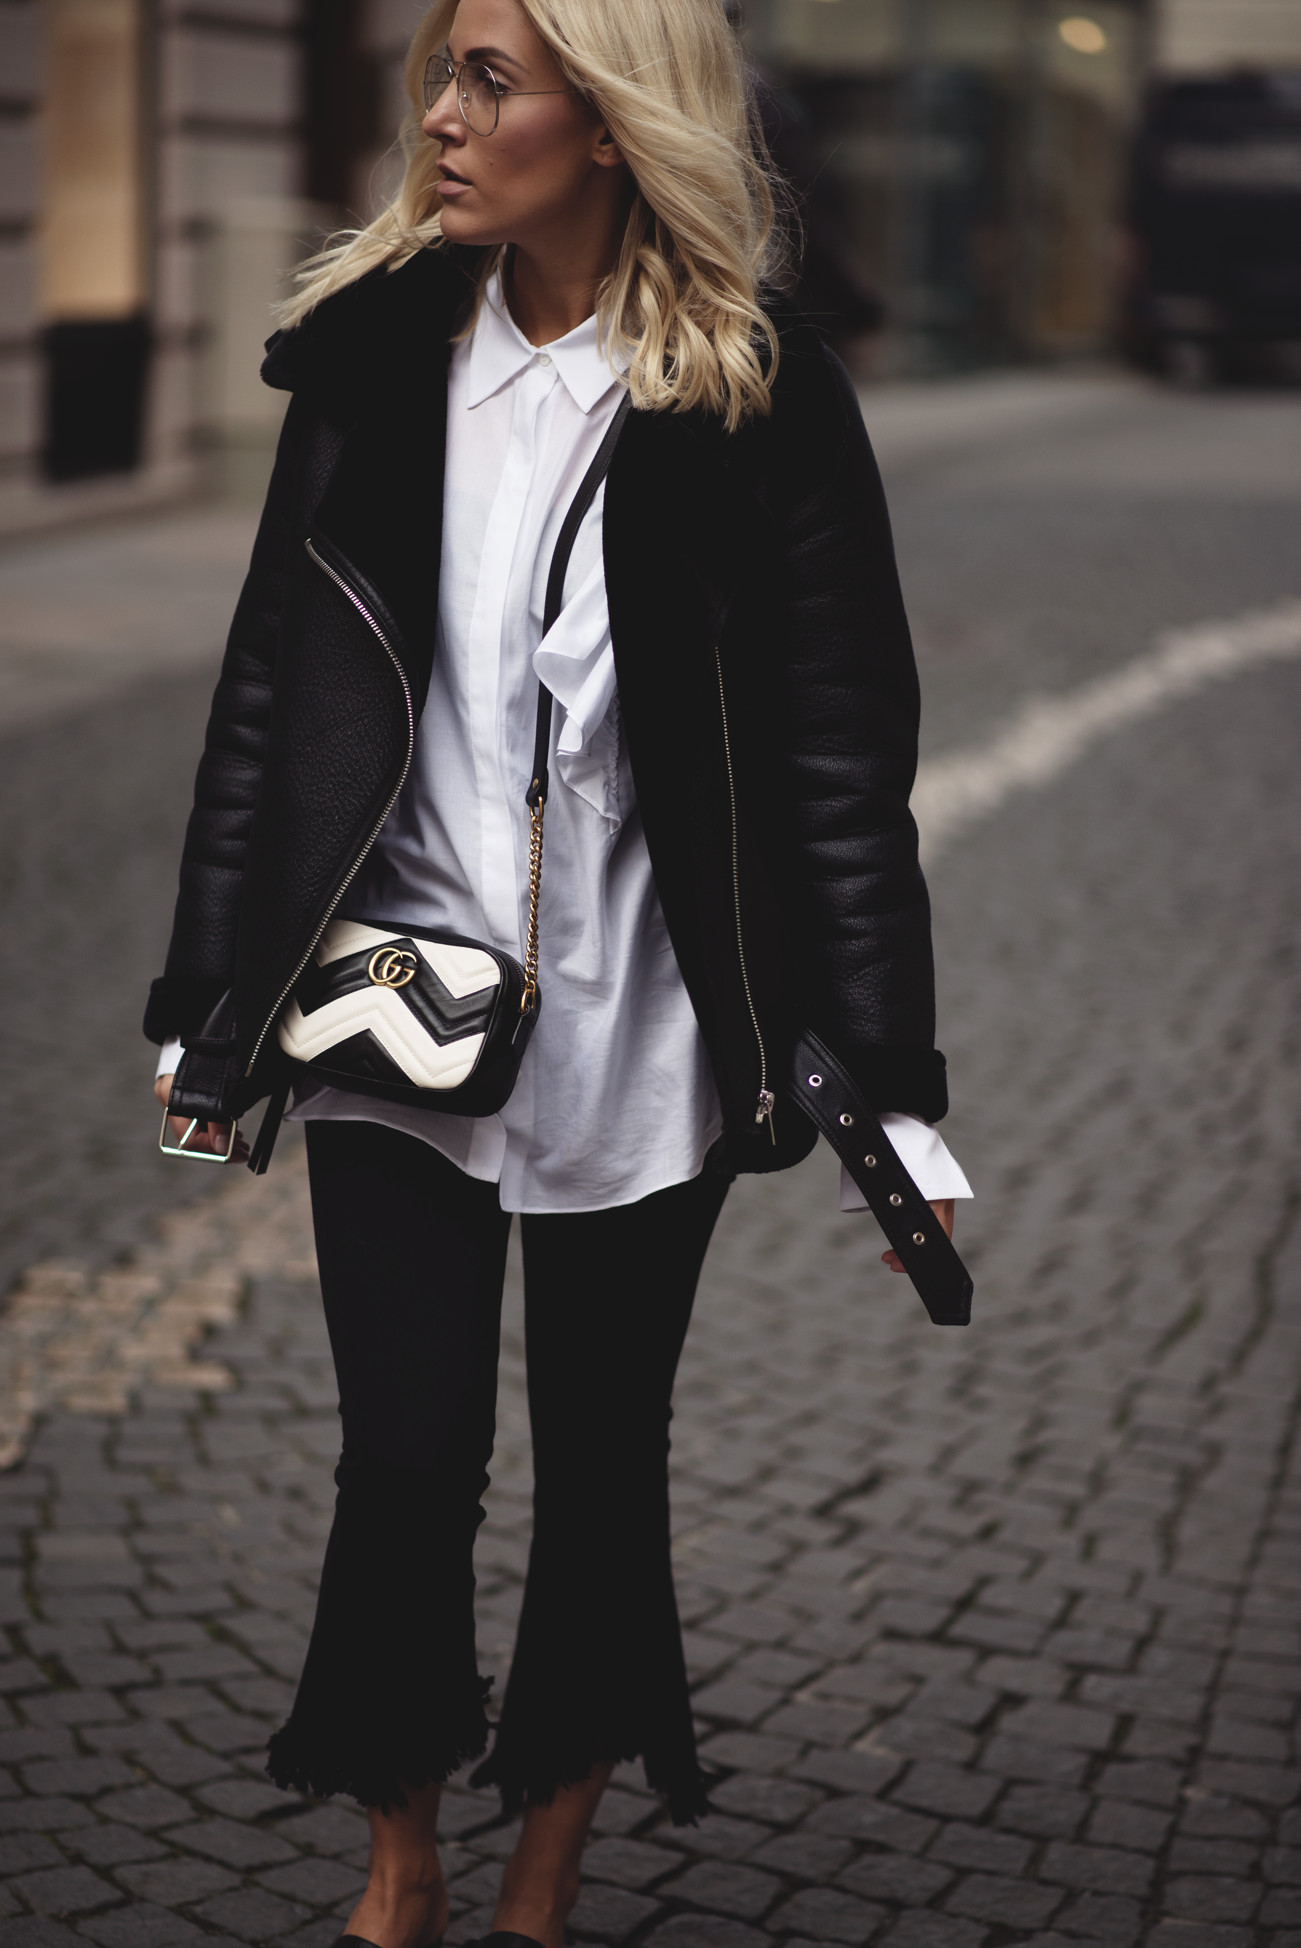 guccimarmont-gucci-fashionblogger-blogger-sequinsophia-munich-8-dsc_2928